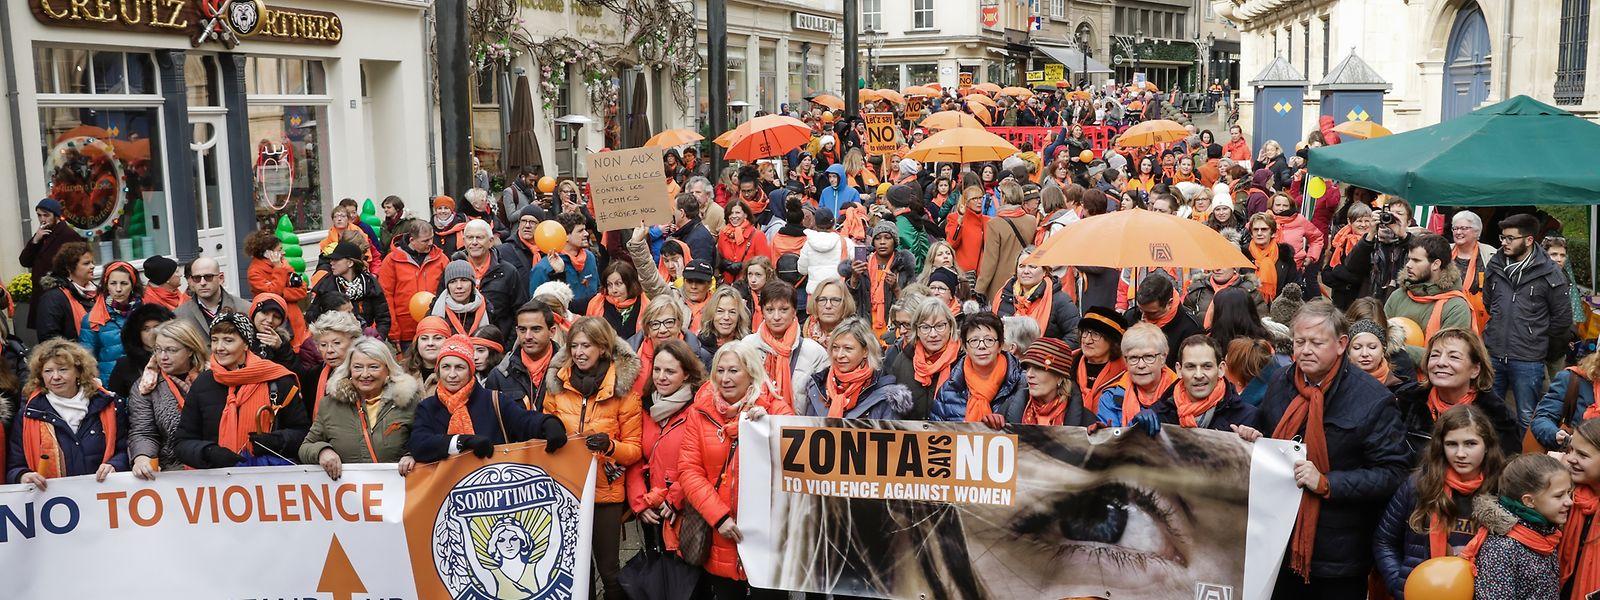 A marcha laranja invadiu as ruas da capital este sábado.